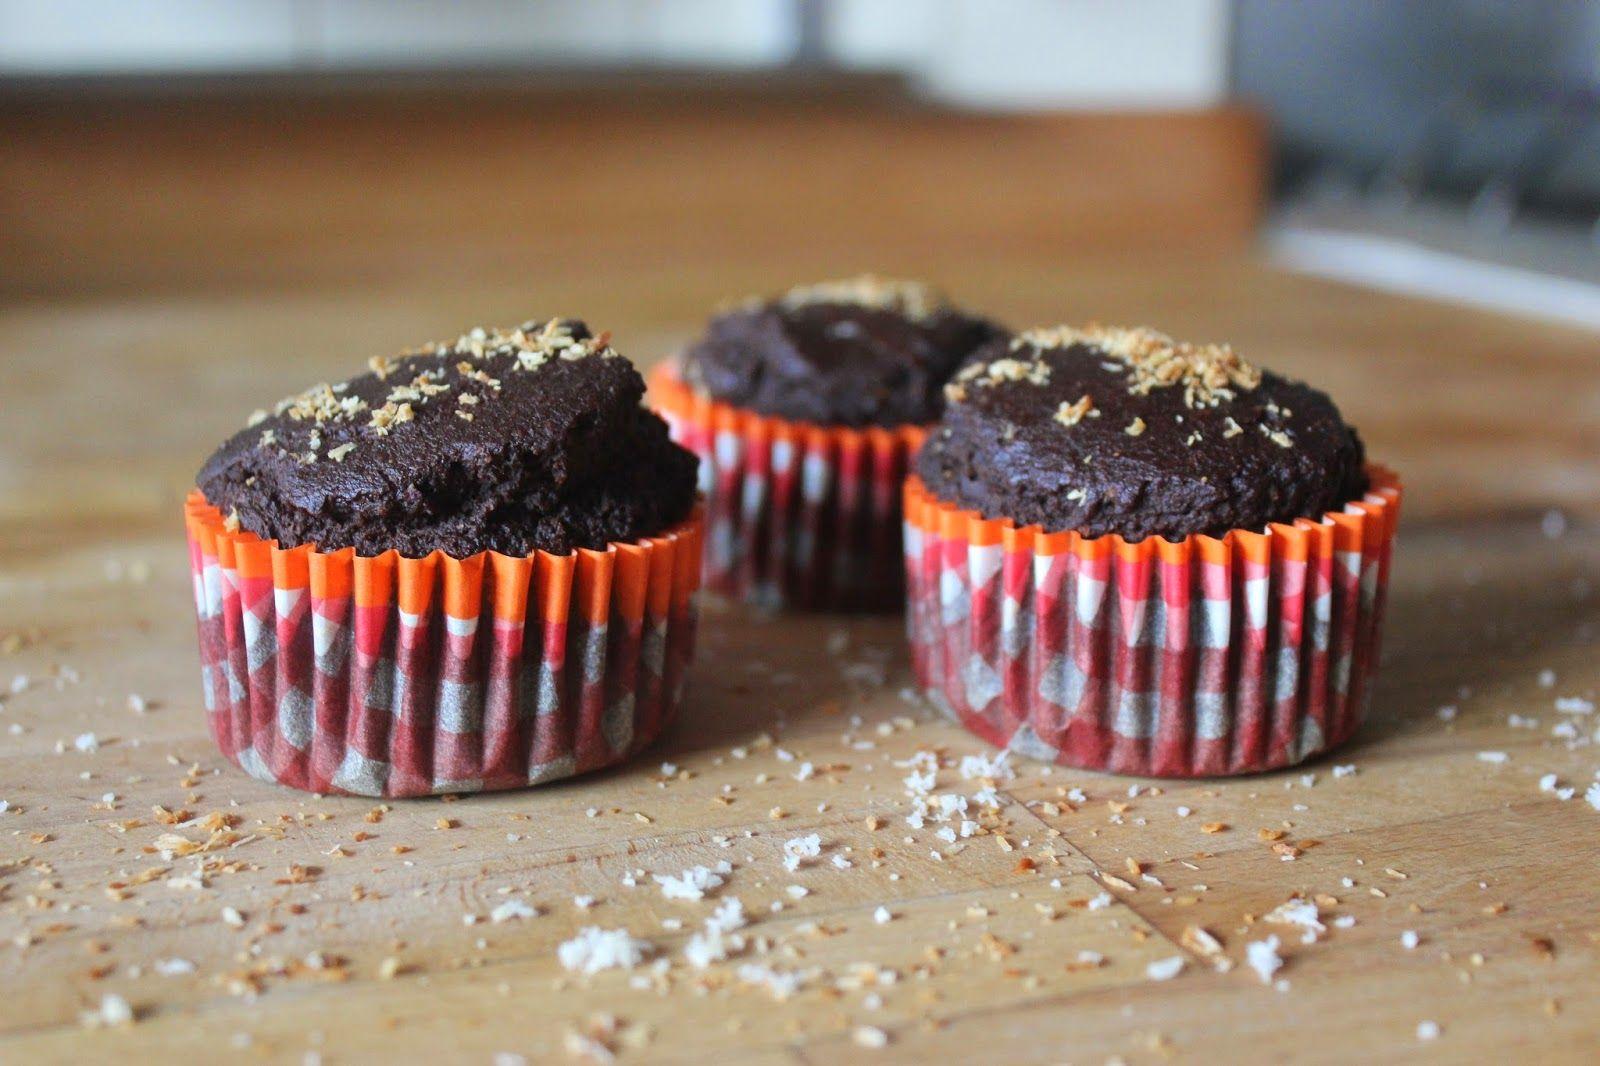 Muffins chocolat parfum coco (farine de coco inside) - vegan